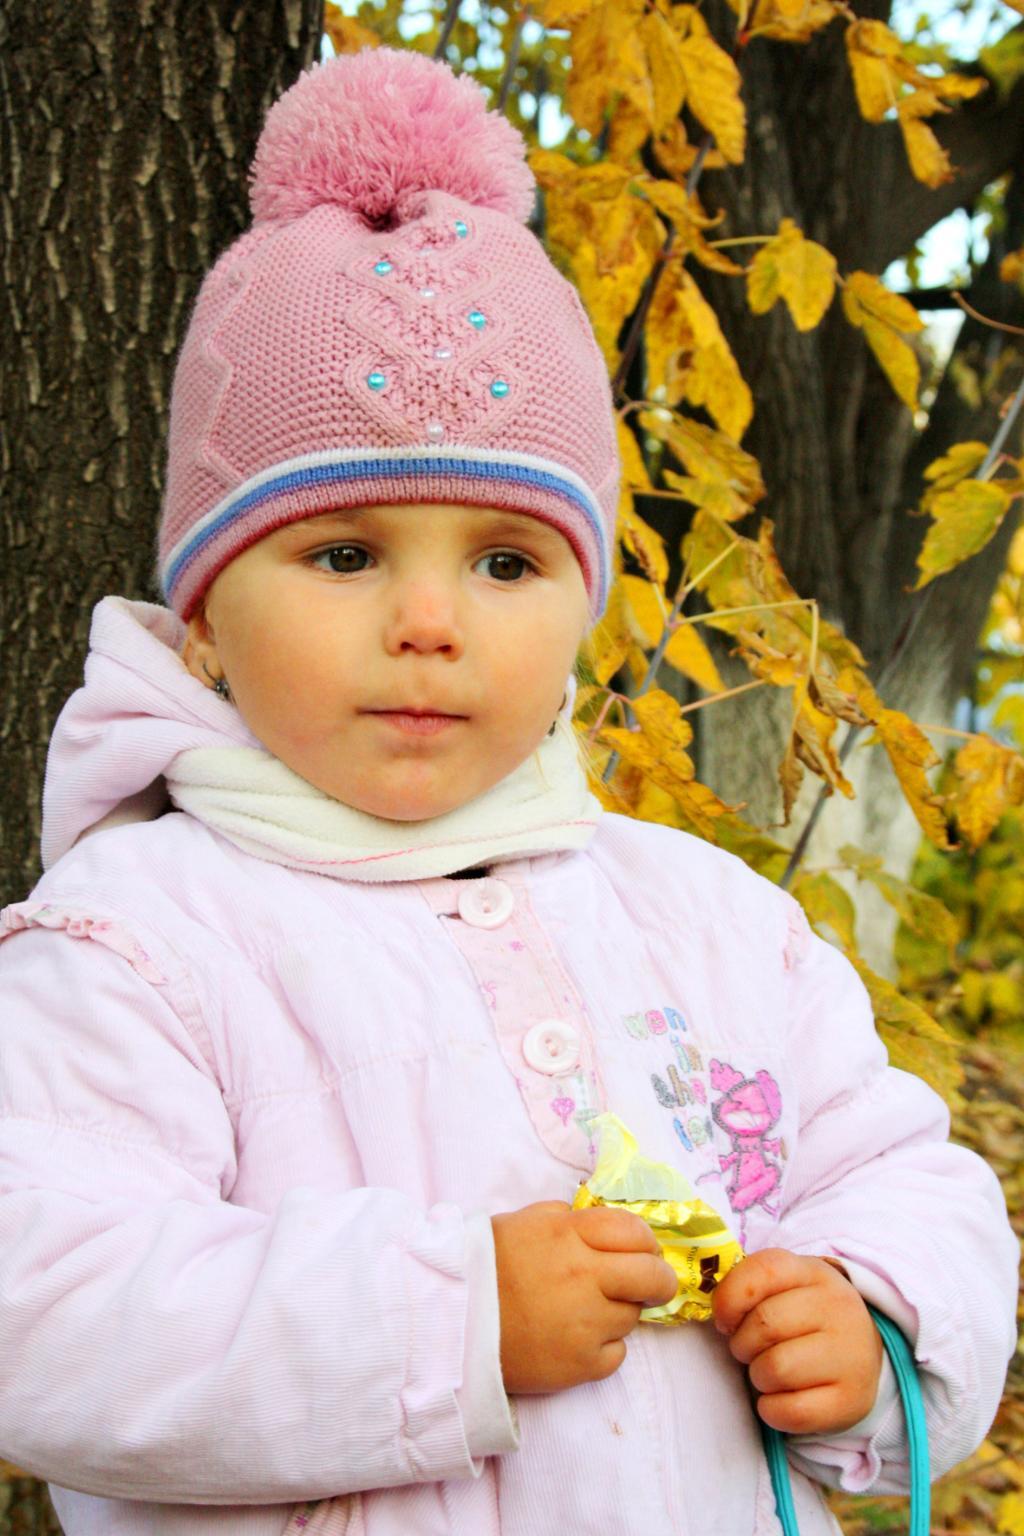 Осень-красивая пора. Осенняя прогулка